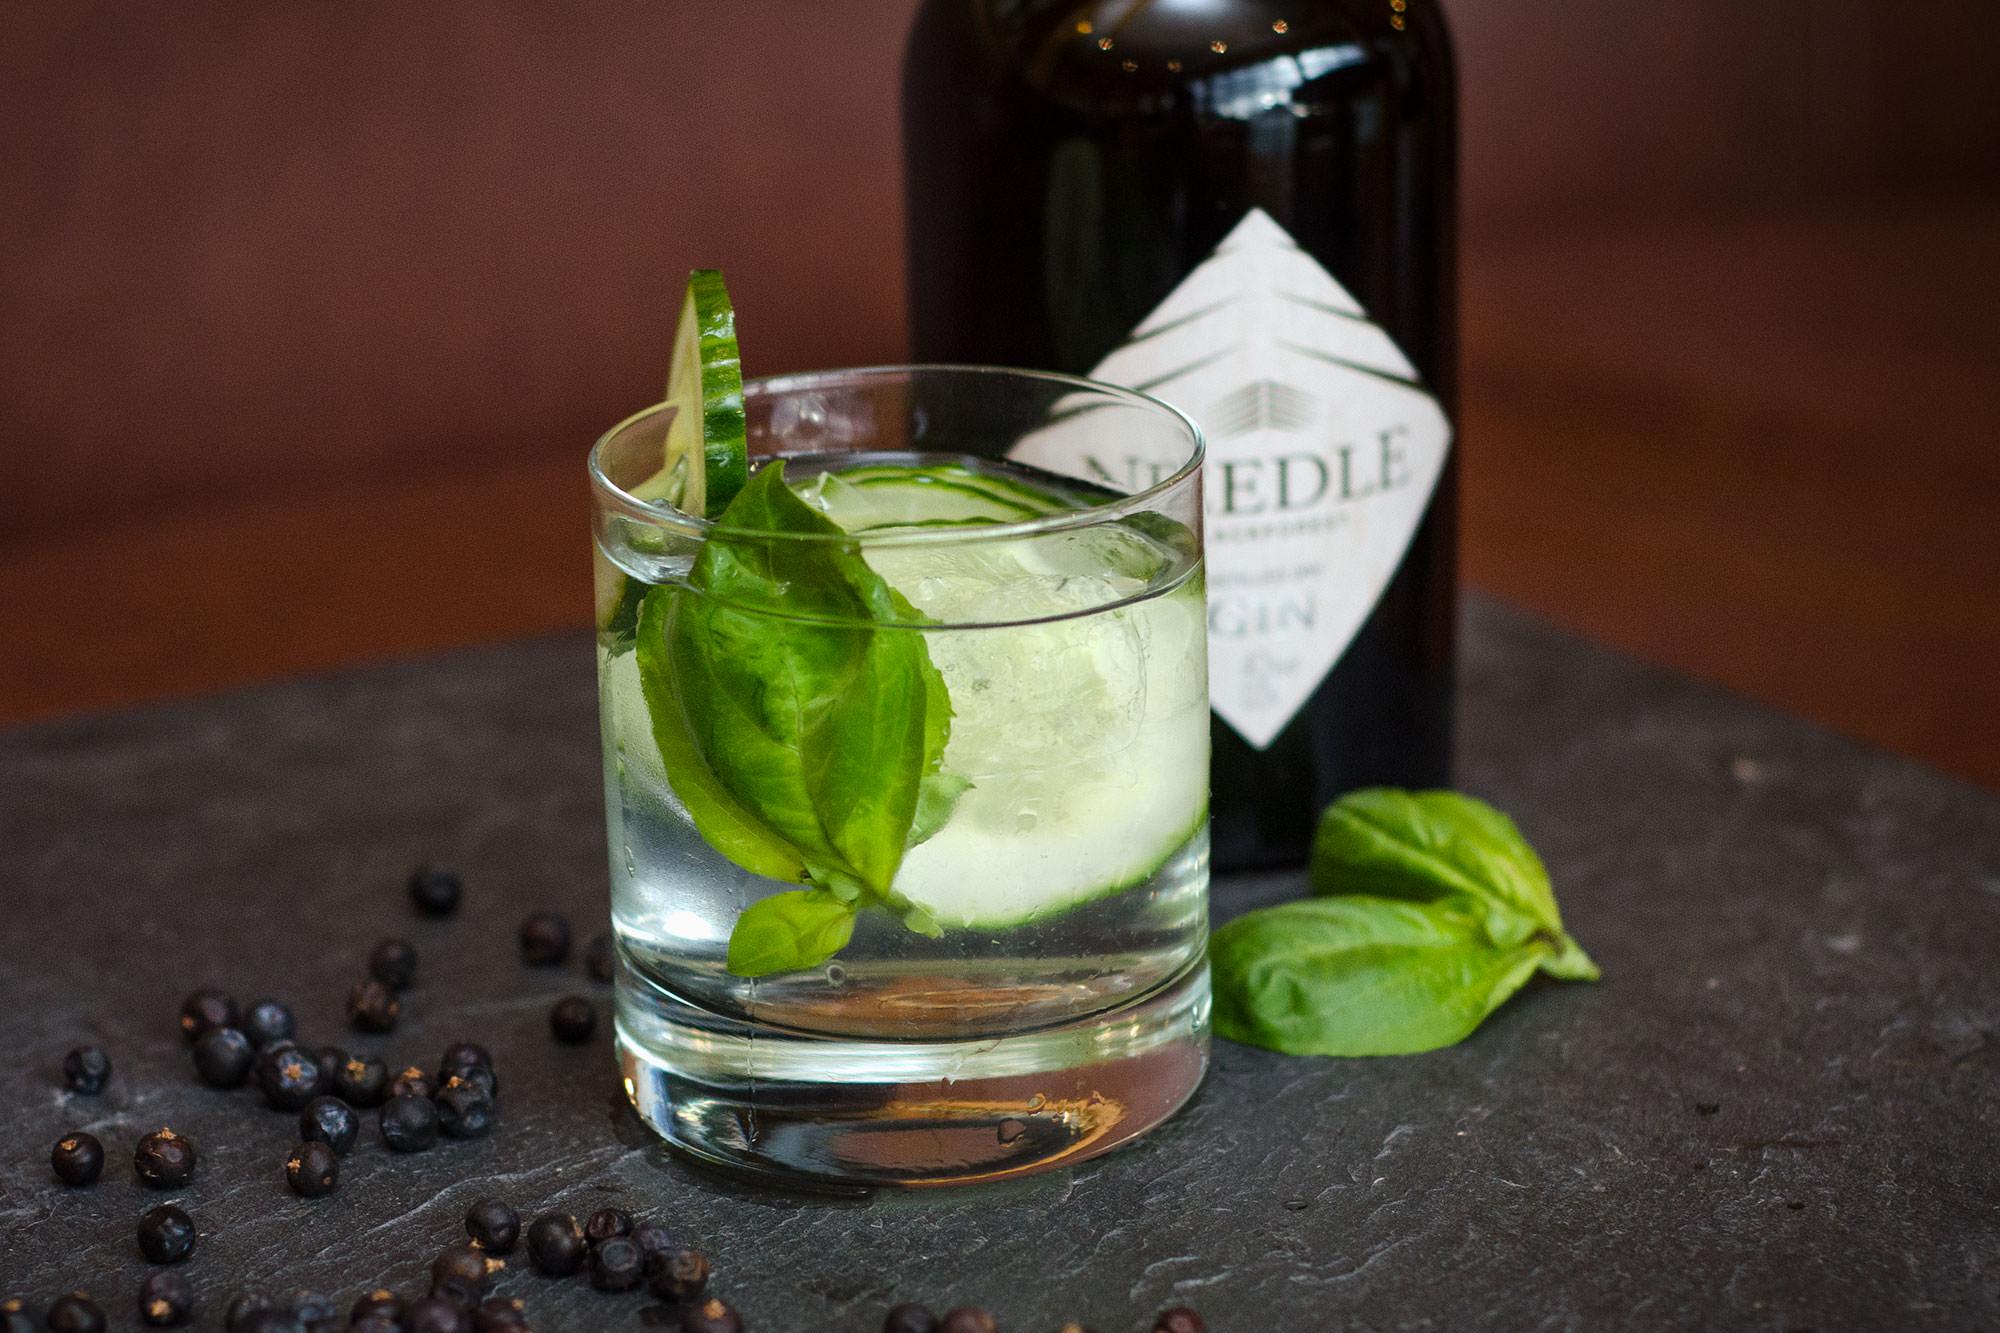 The GBC - Gin, Basilikum, Cucumber